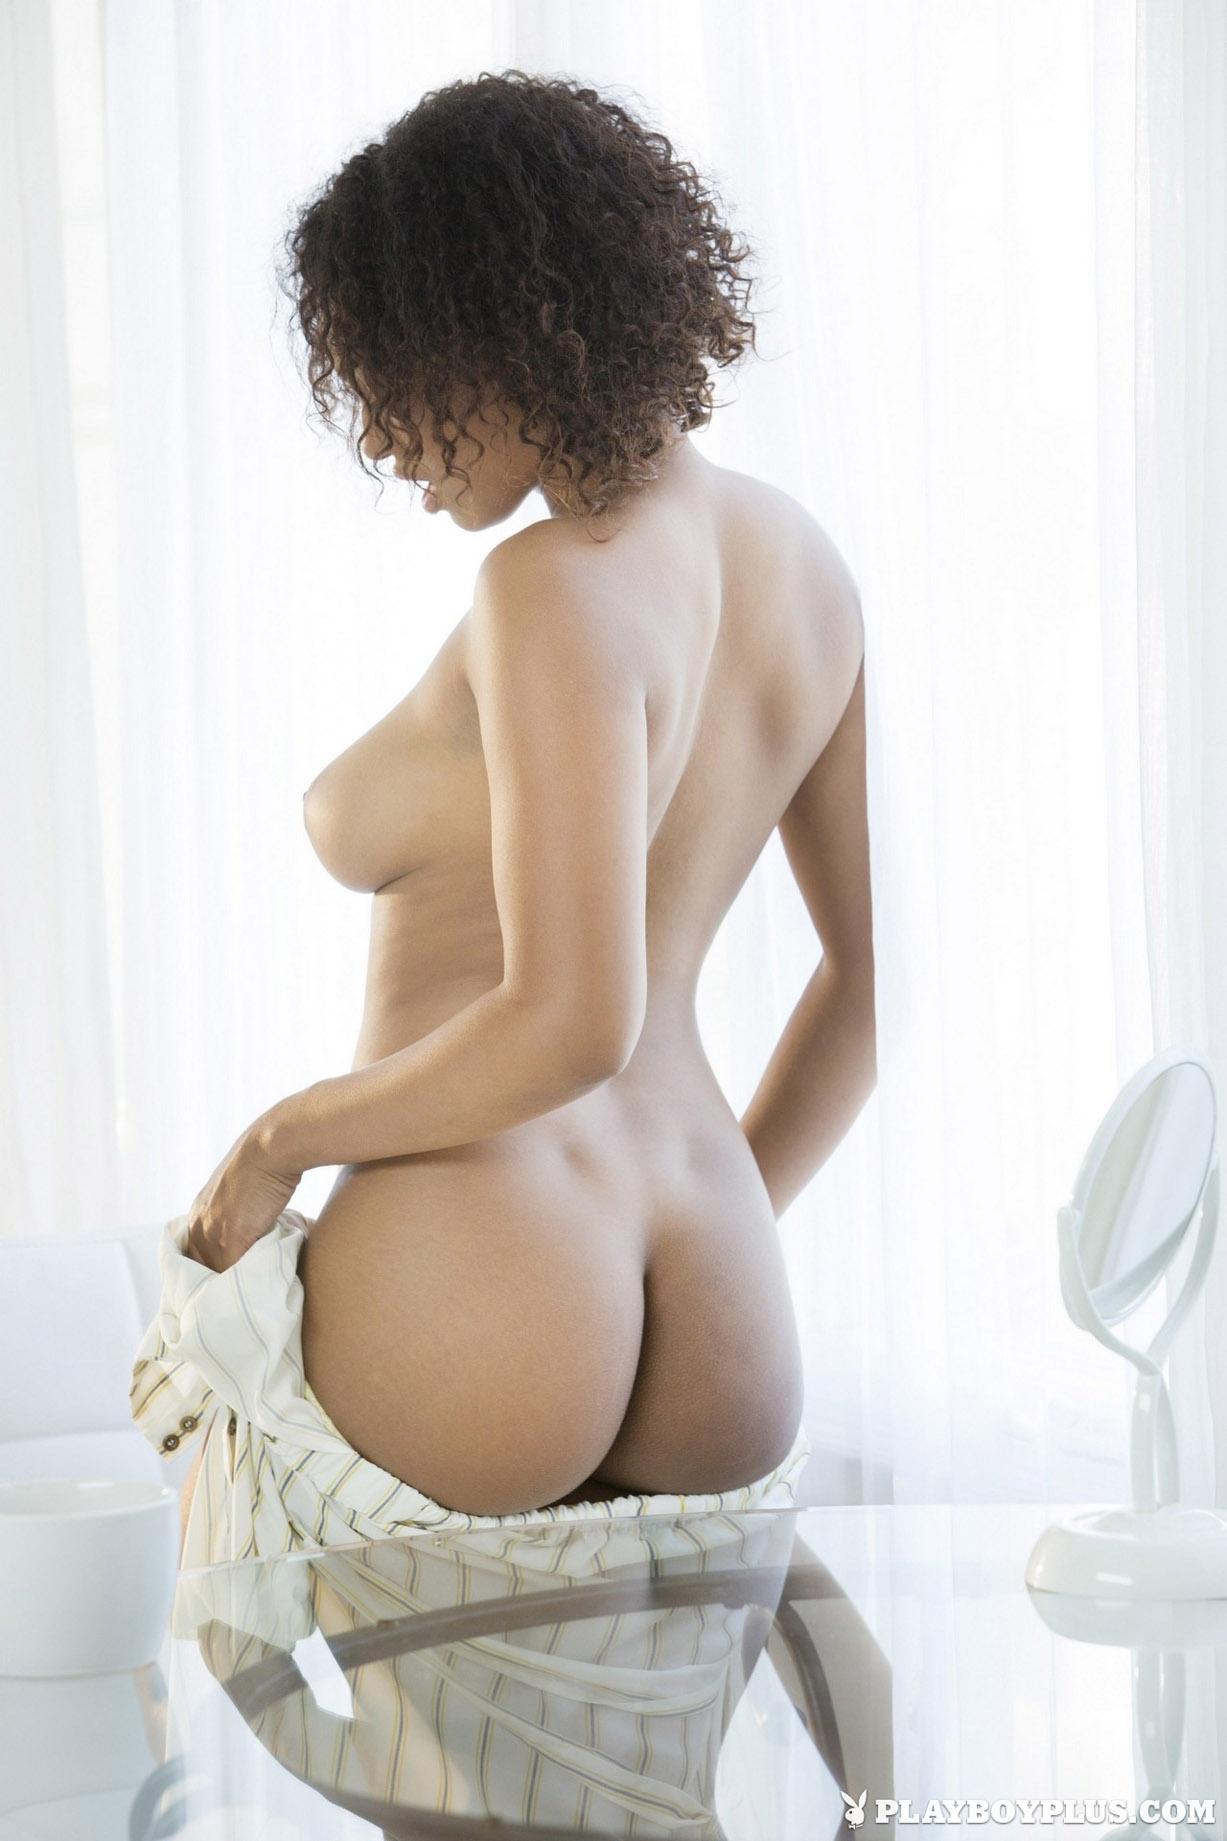 Noelle Monique nude in PlayboyPlus